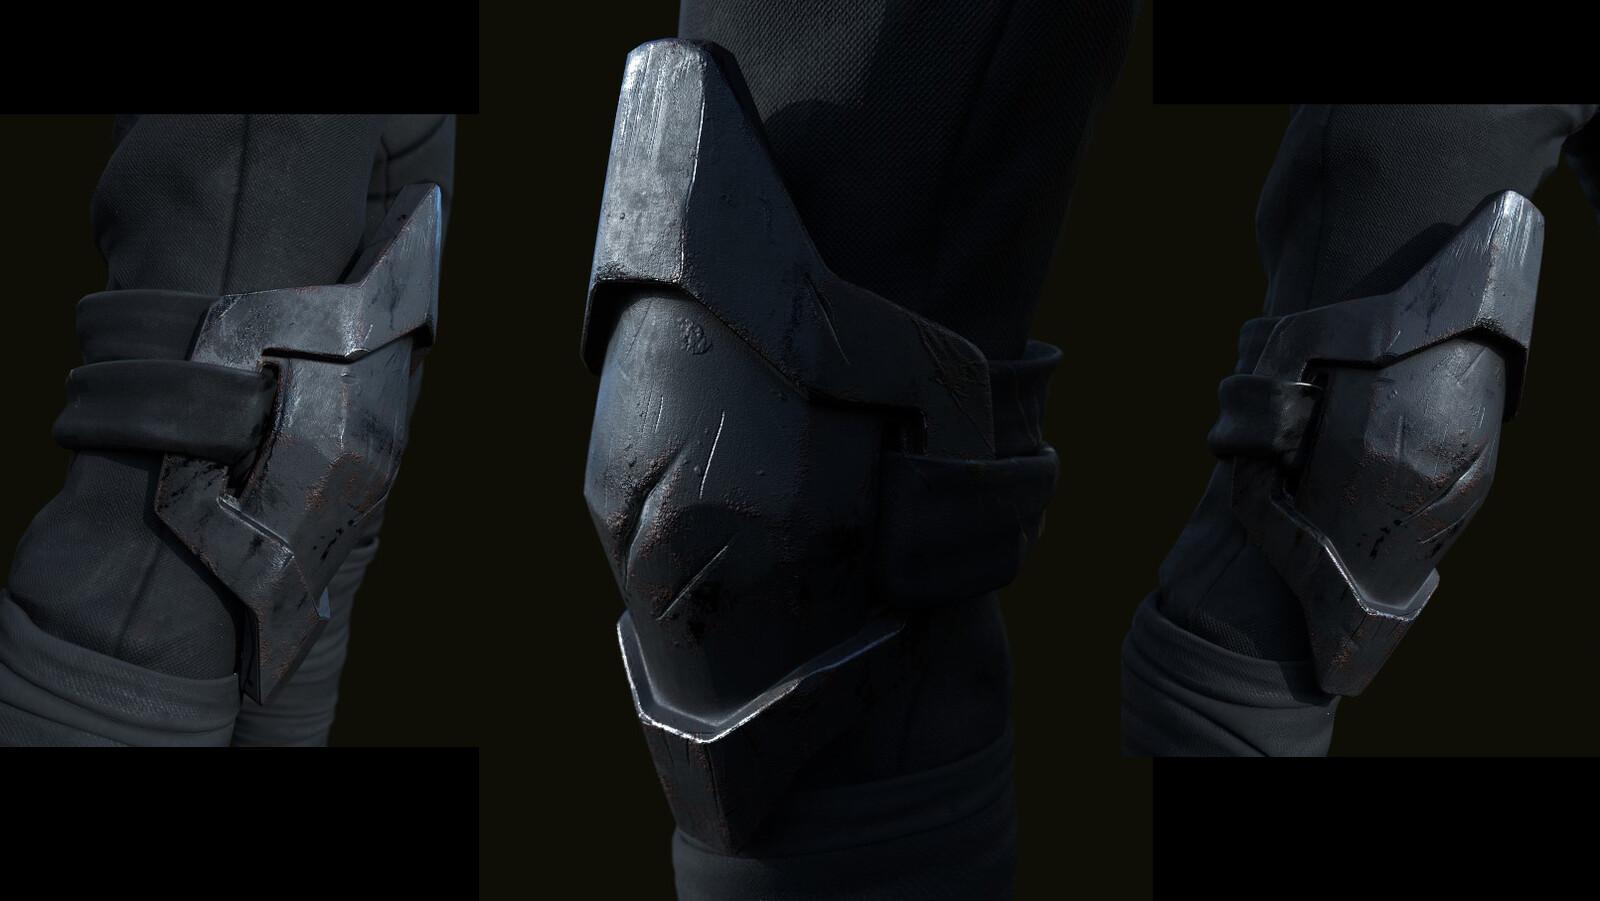 KneePads Texture